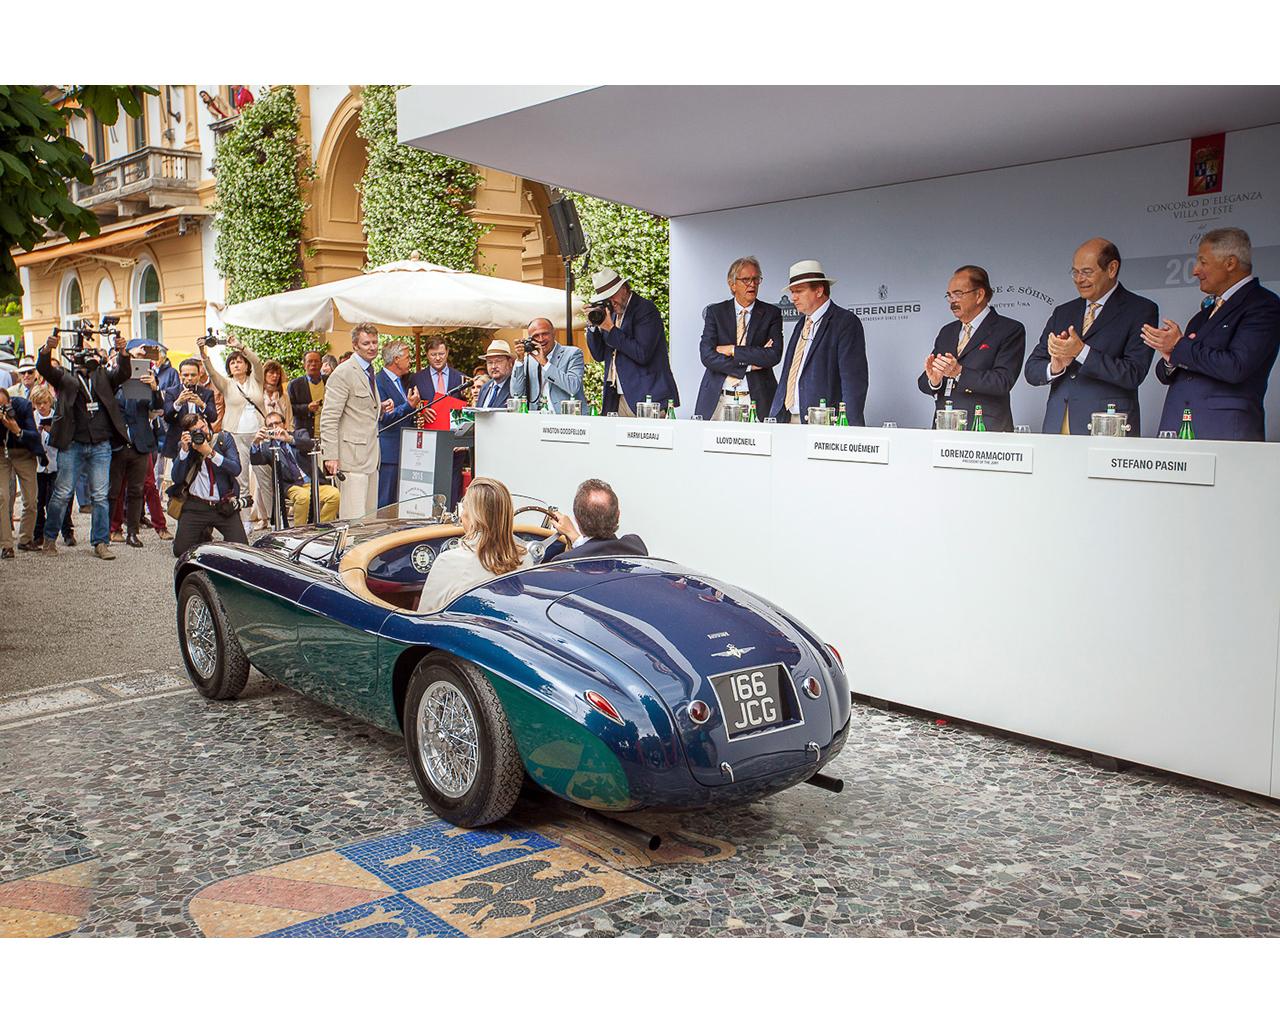 A.Lange & Söhne - Concorso d'Eleganza Villa d'Este 2015 - Ben Gierig - Fotografie